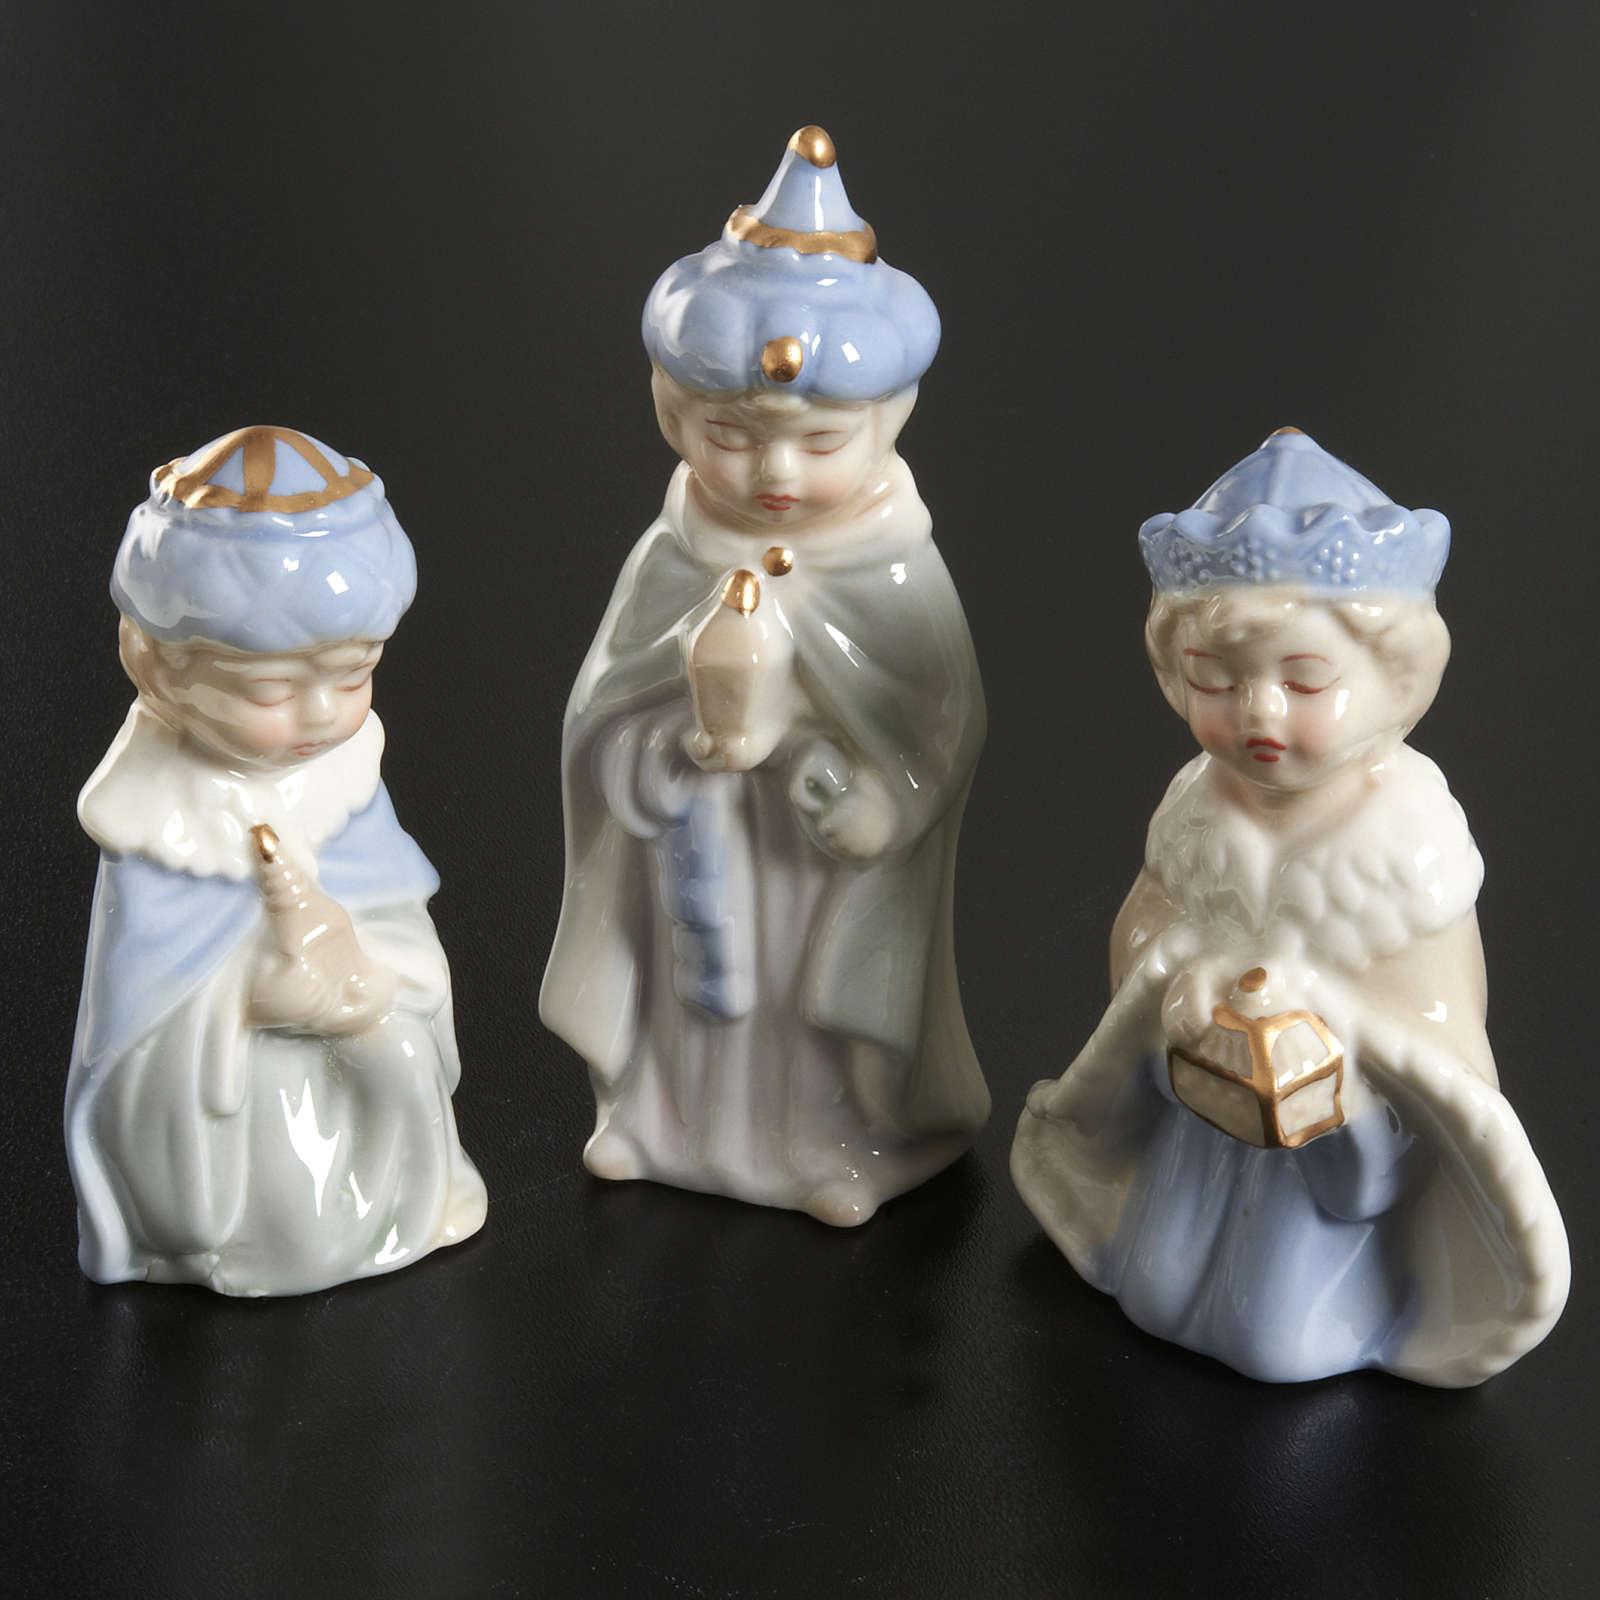 Presepe completo ceramica 11 statuine 10 cm 4